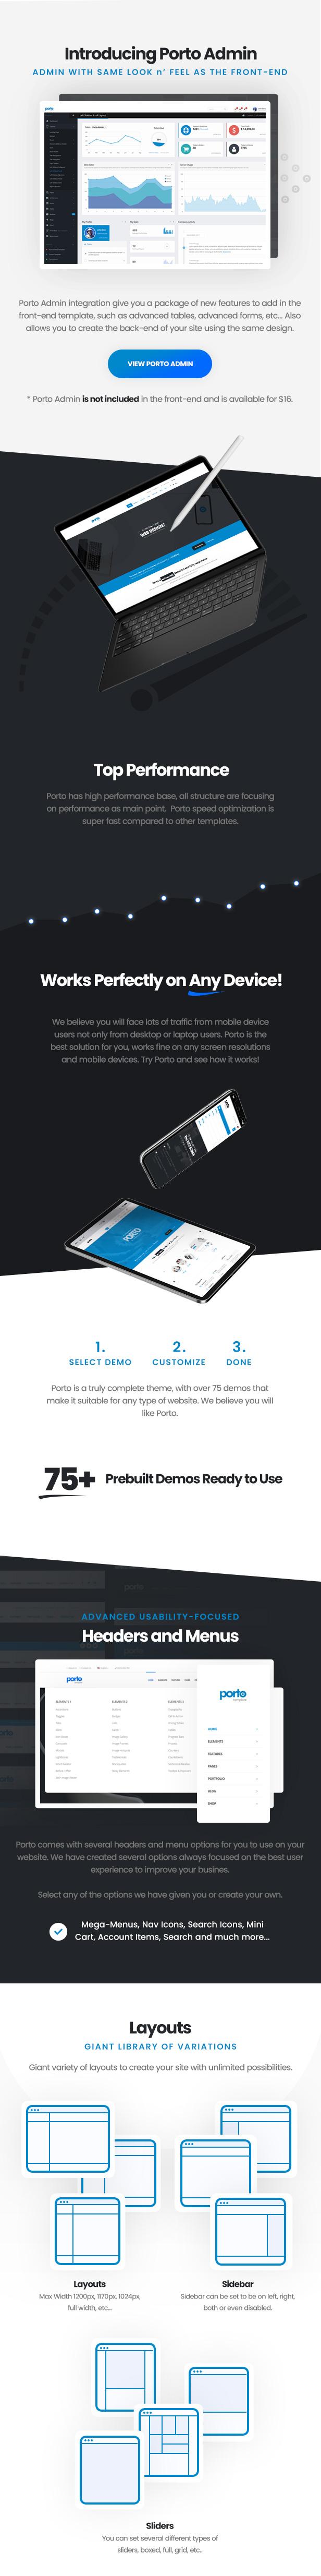 Porto - Responsive HTML5 Template - 3